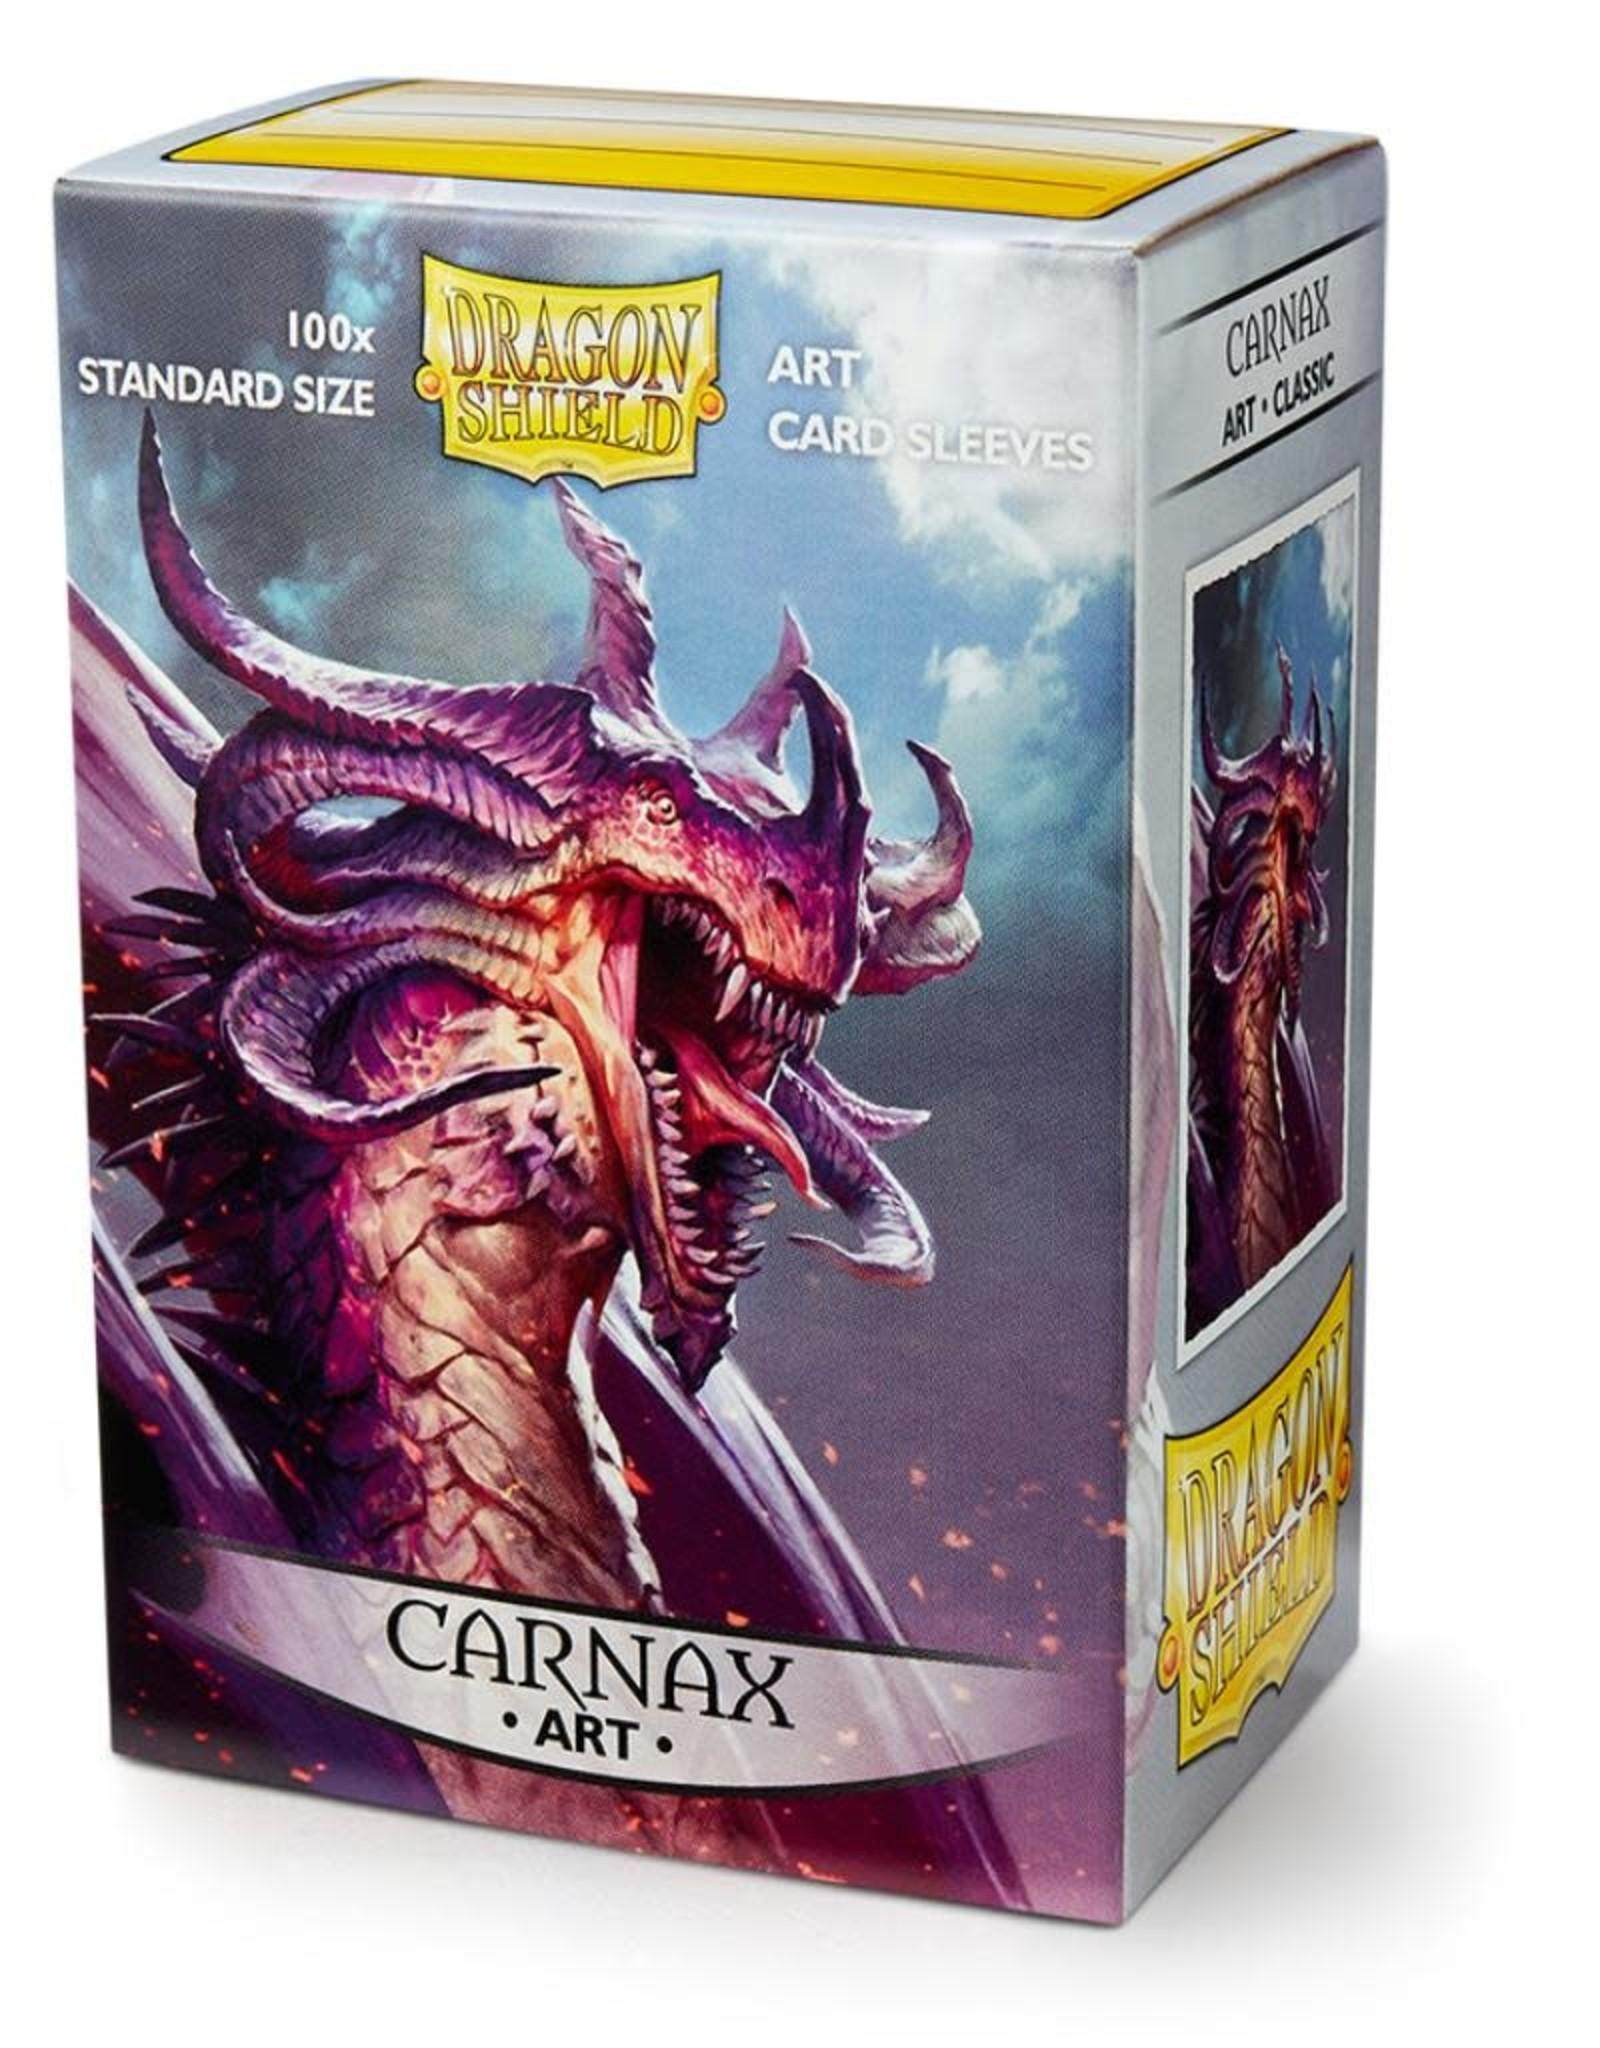 Dragon Shield Carnax - Full Art